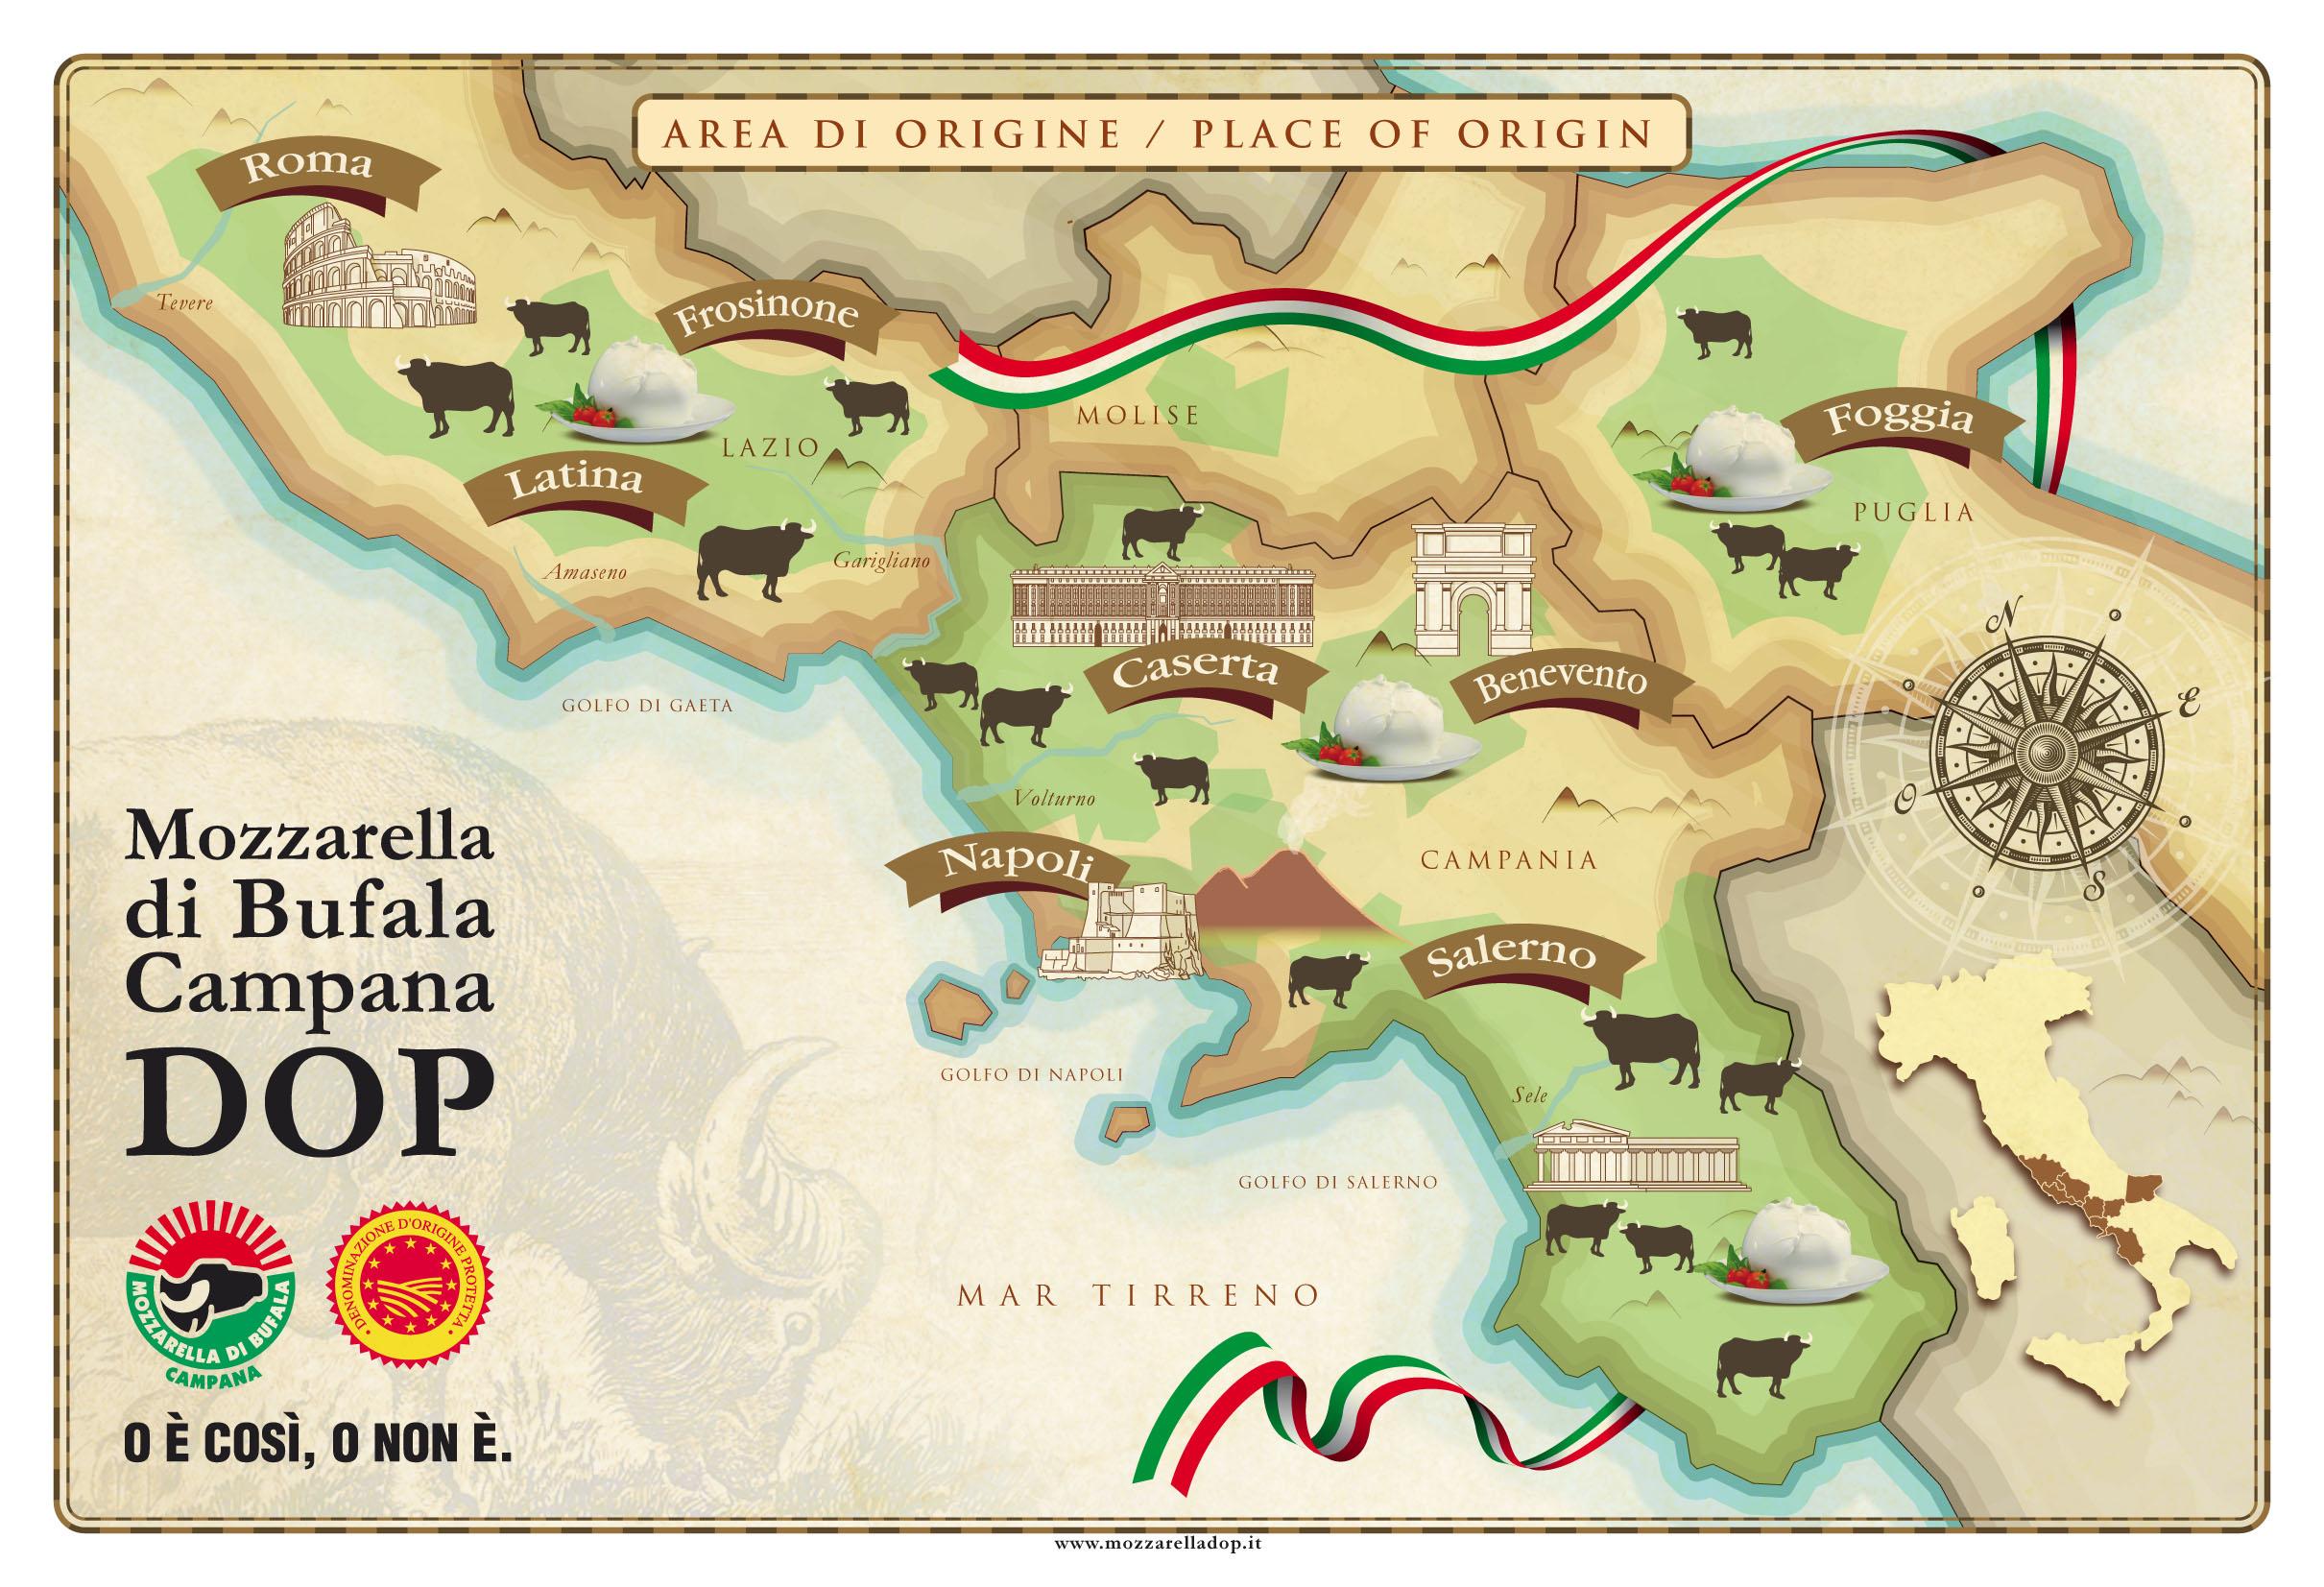 Zones de production de la mozzarella di bufala AOP